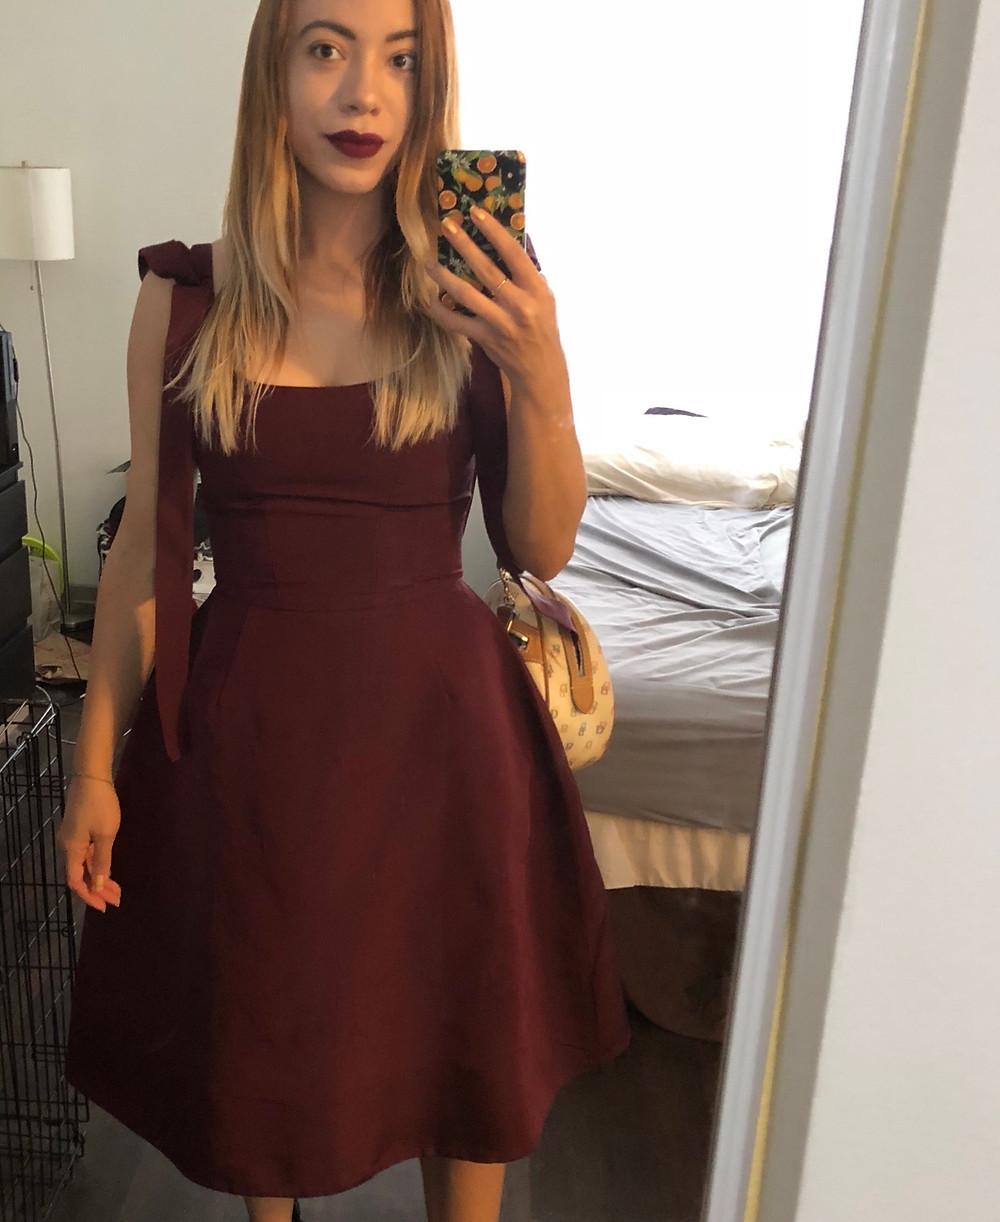 Katrina-Belle-Orlando-Blogger-Christian Siriano-Dress